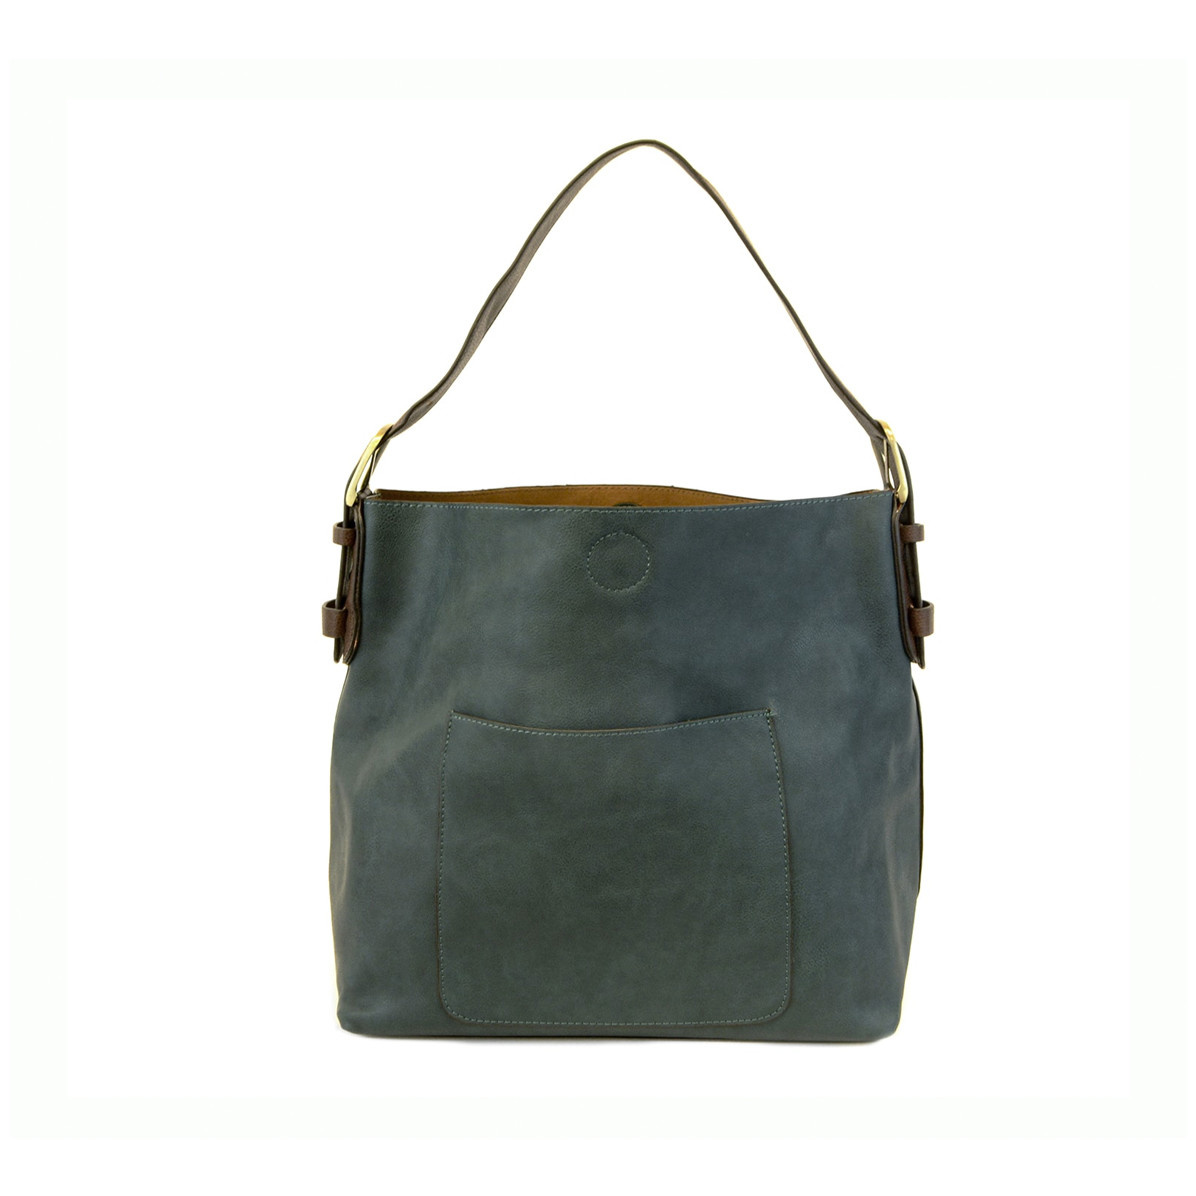 Joy Susan Joy Susan Classic Hobo Handbag Dark Teal